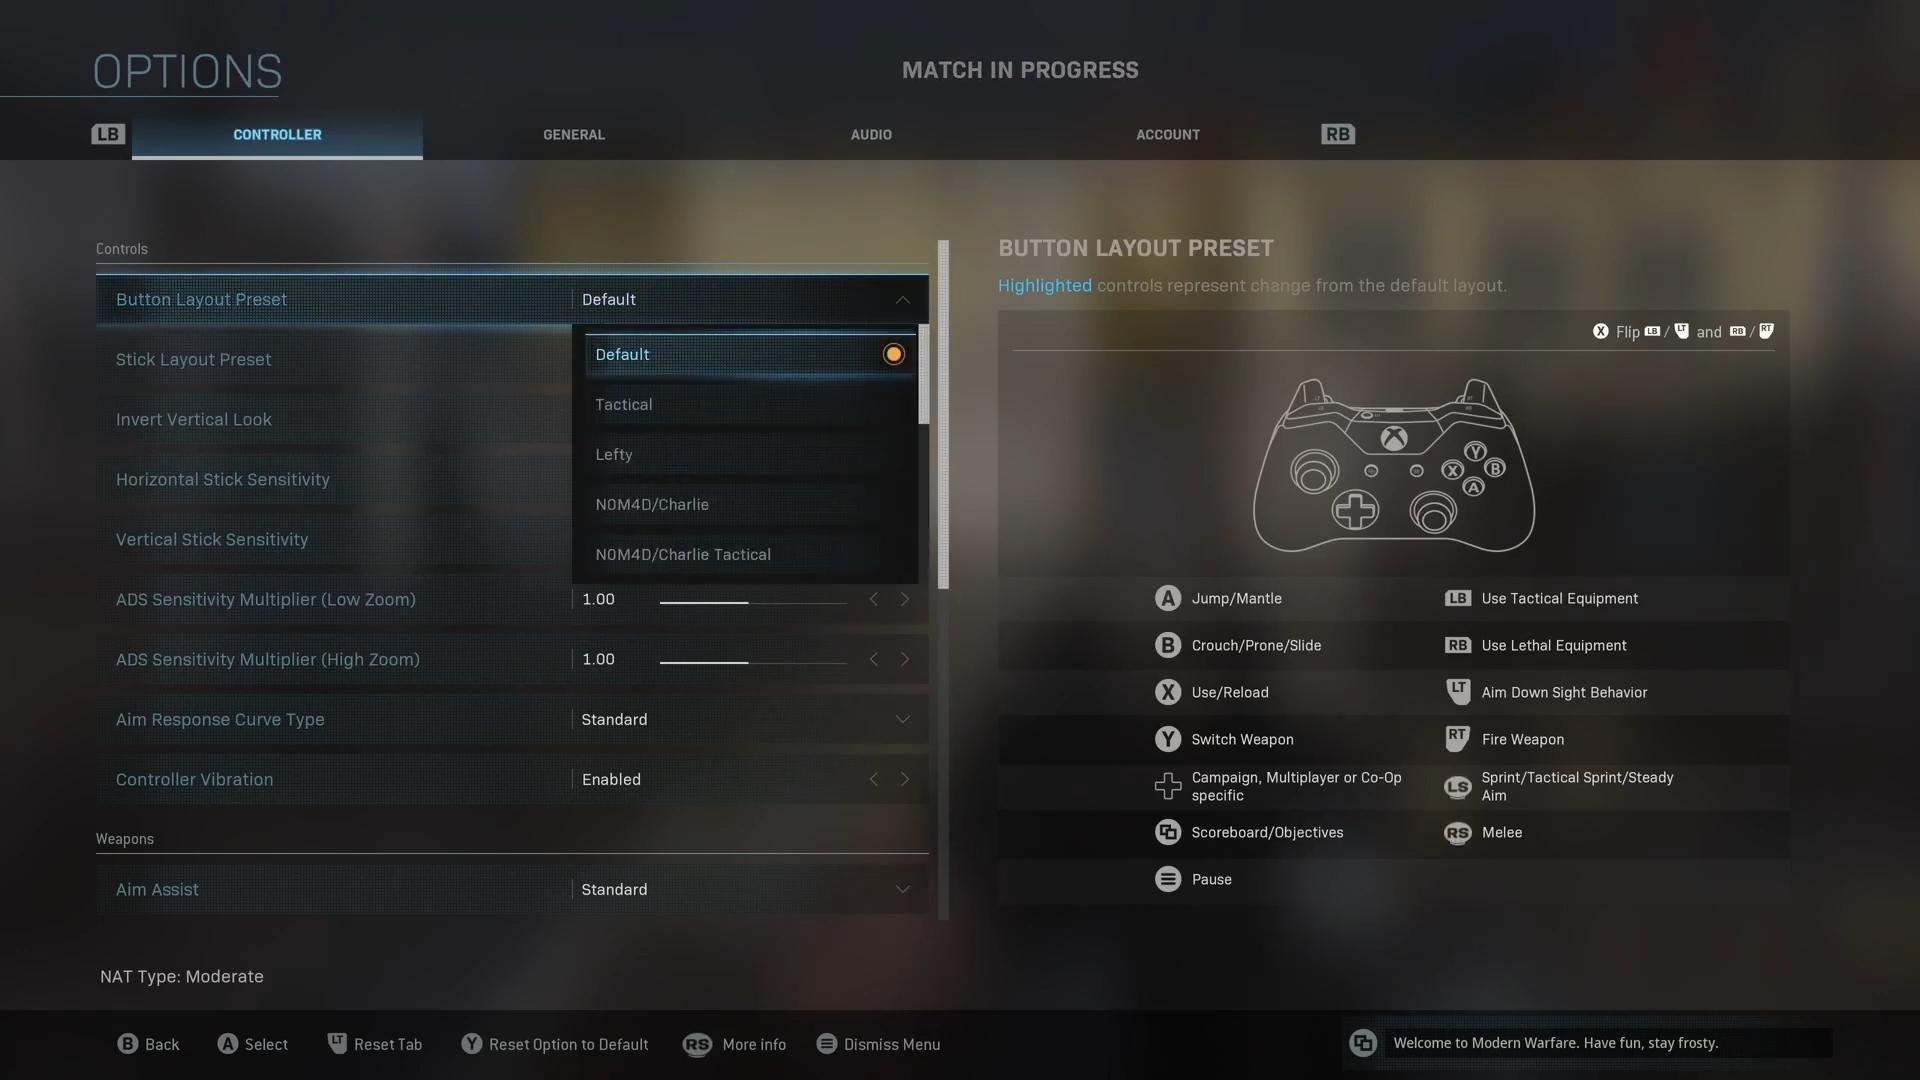 Screenshot showing Call of Duty Modern Warfare controller layout options.